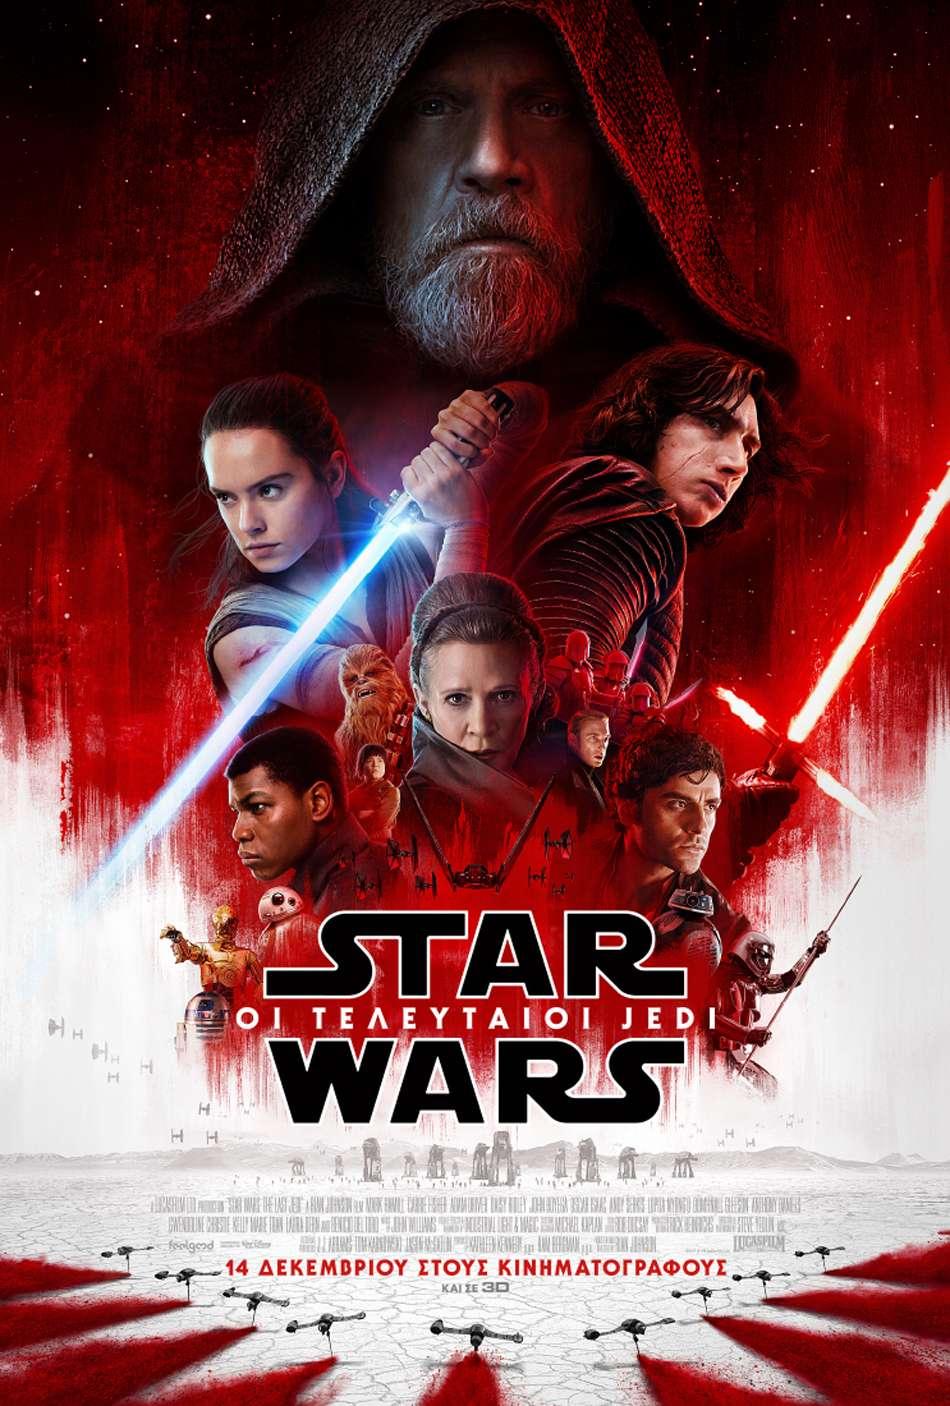 Star Wars: Οι Τελευταίοι Τζεντάι (Star Wars: The Last Jedi) Poster Πόστερ